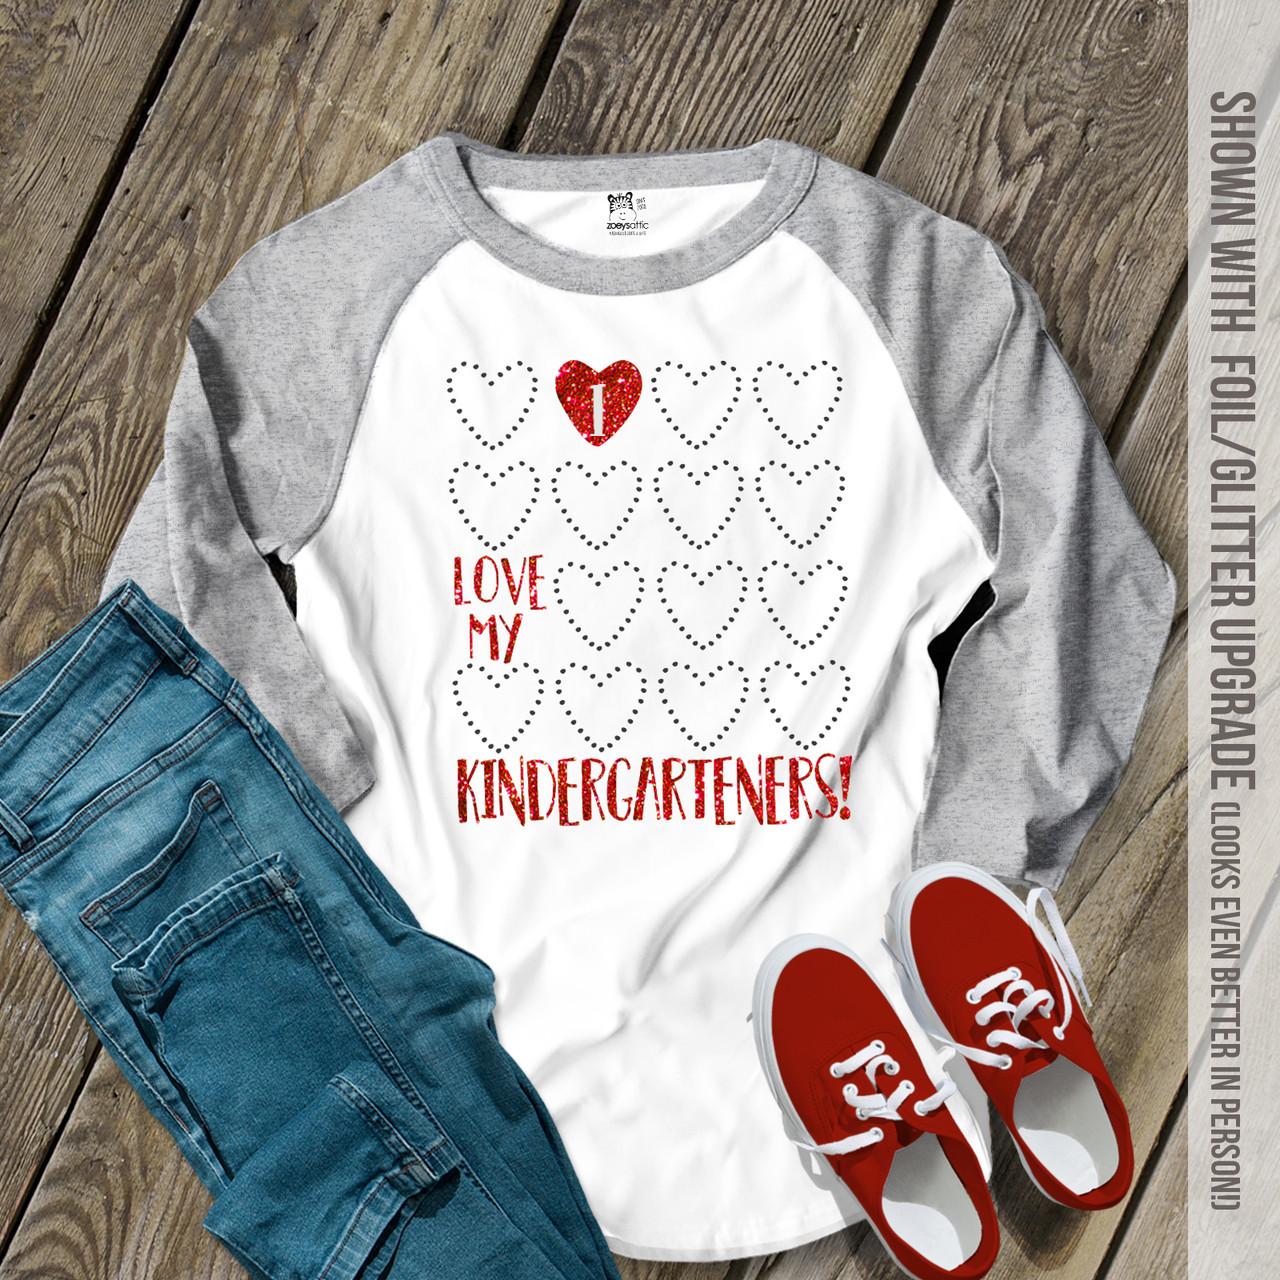 b386e227868cc Teacher I love my kindergarteners or any grade glitter or foil heart  Valentine adult raglan shirt